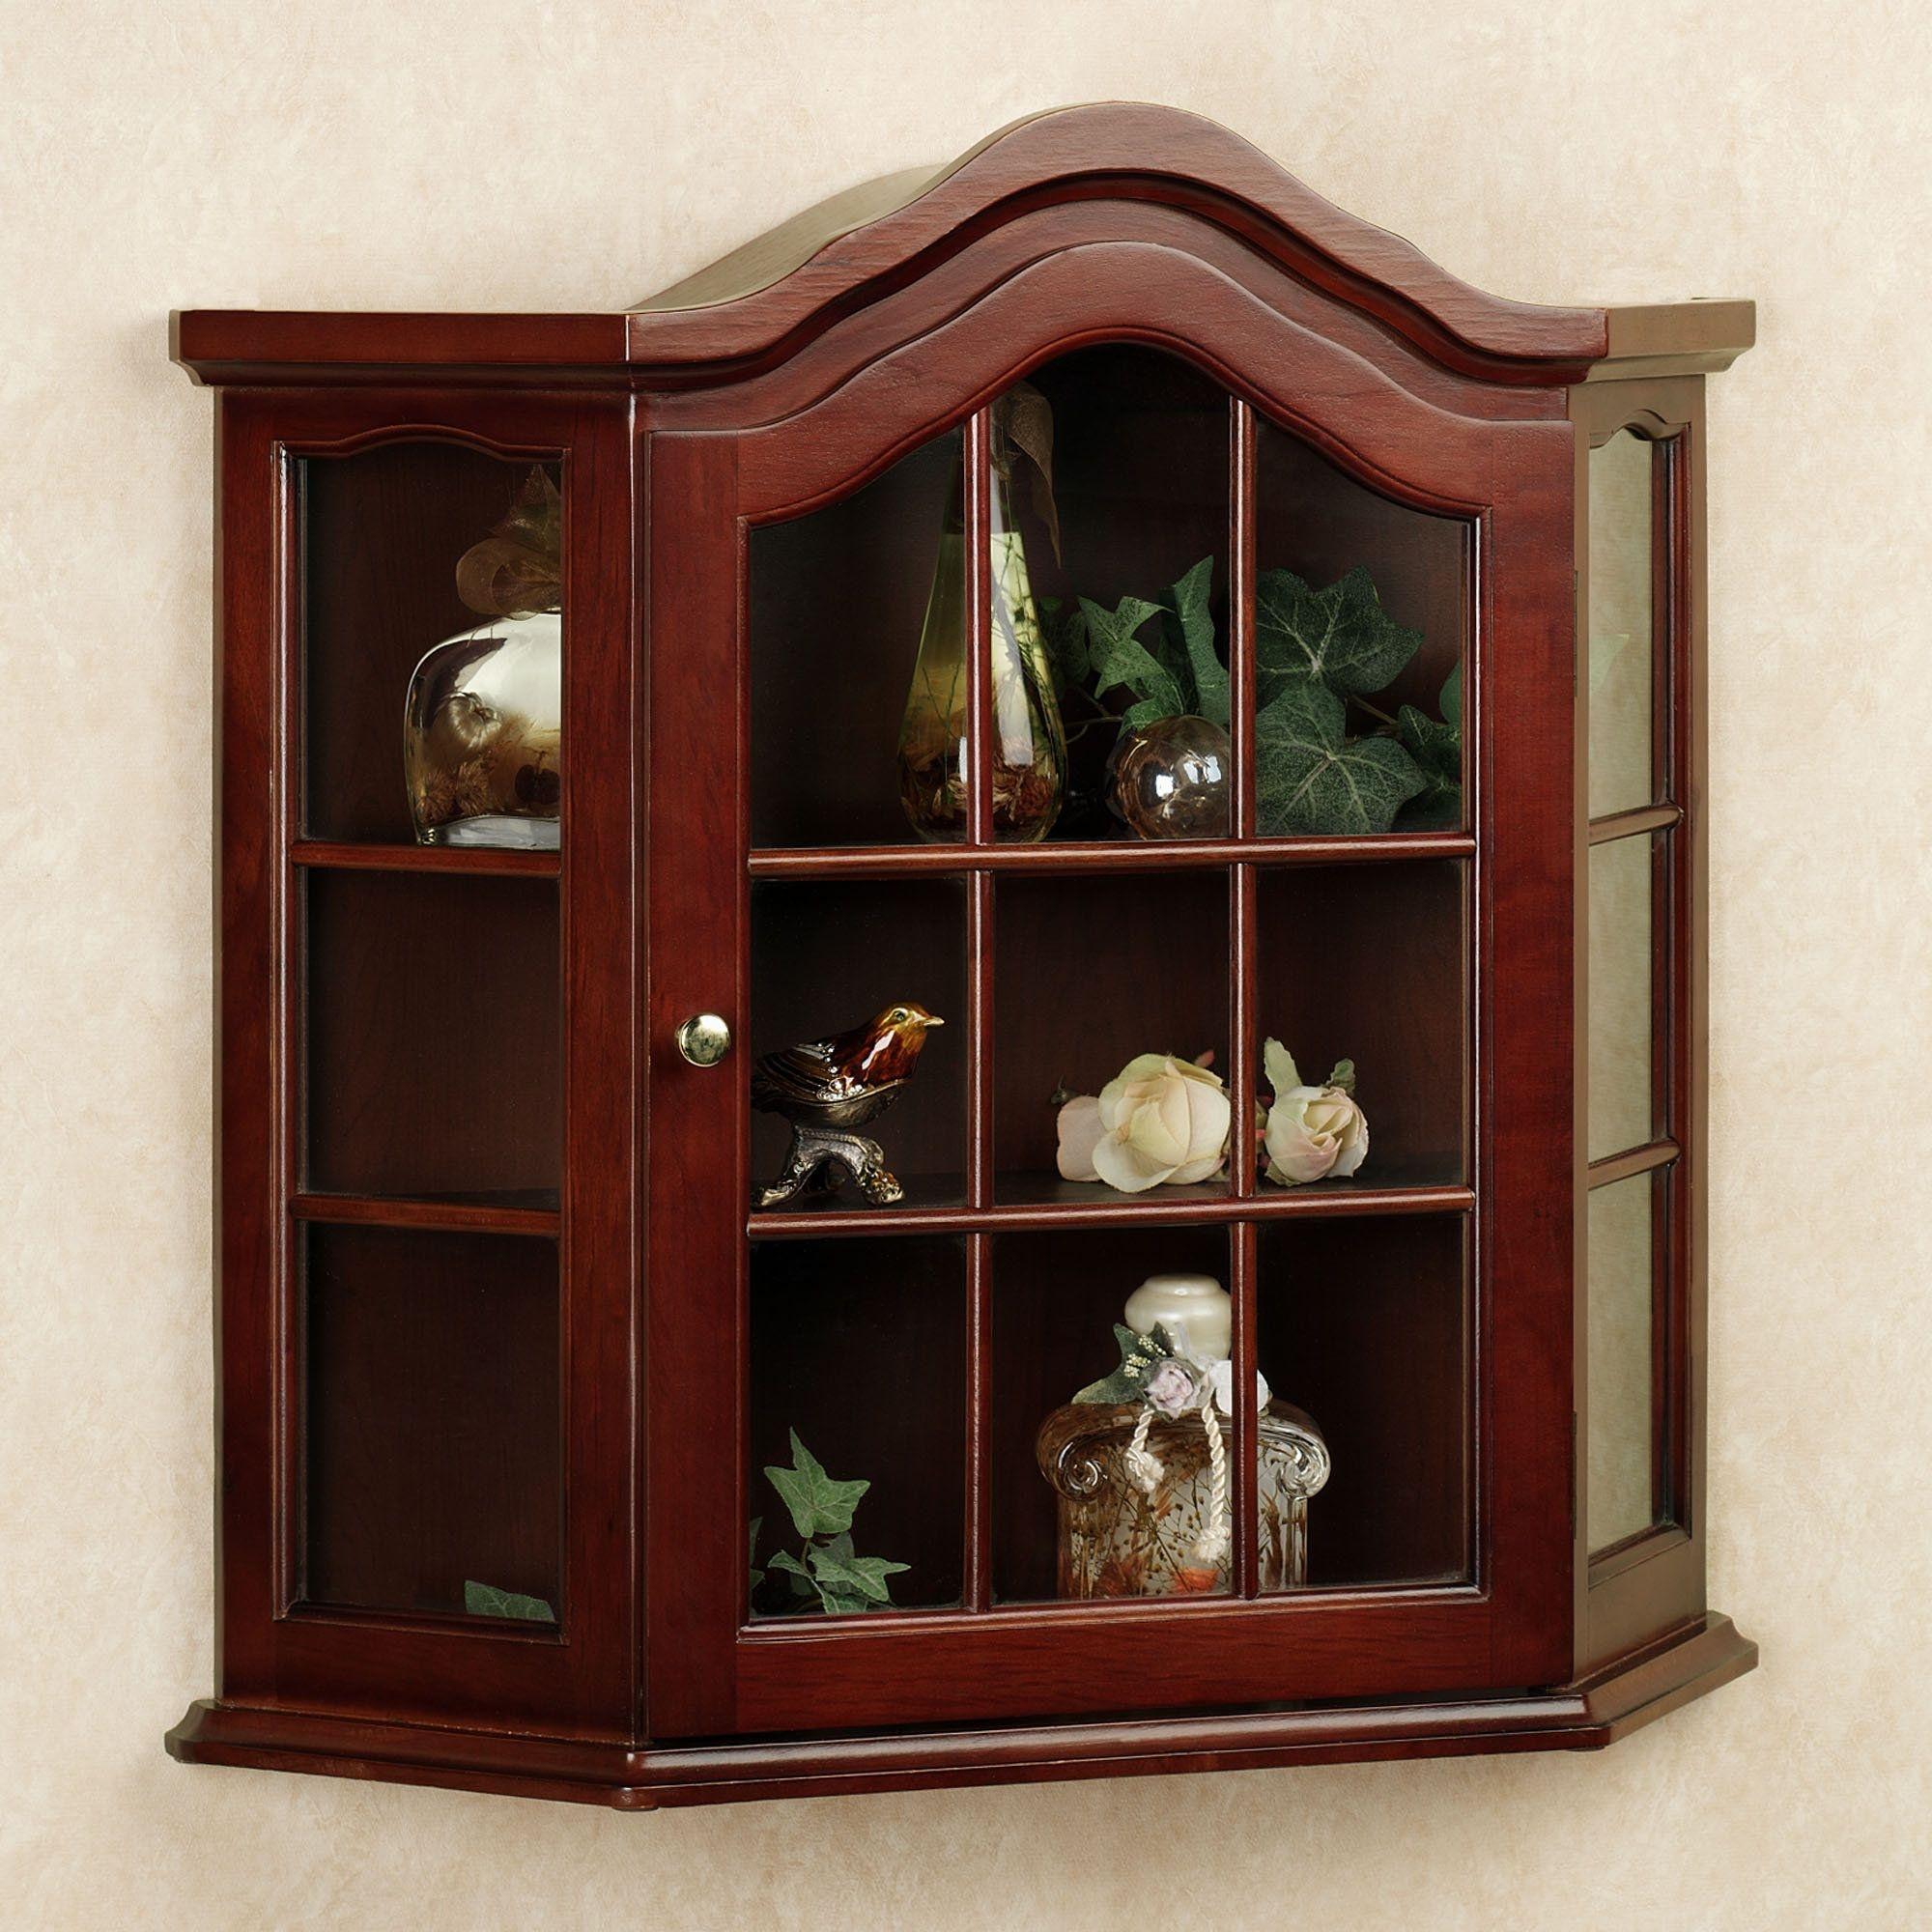 small wall curio cabinet ideas on foter rh foter com wall mounted curio cabinets cheap wall mounted curio cabinet ikea